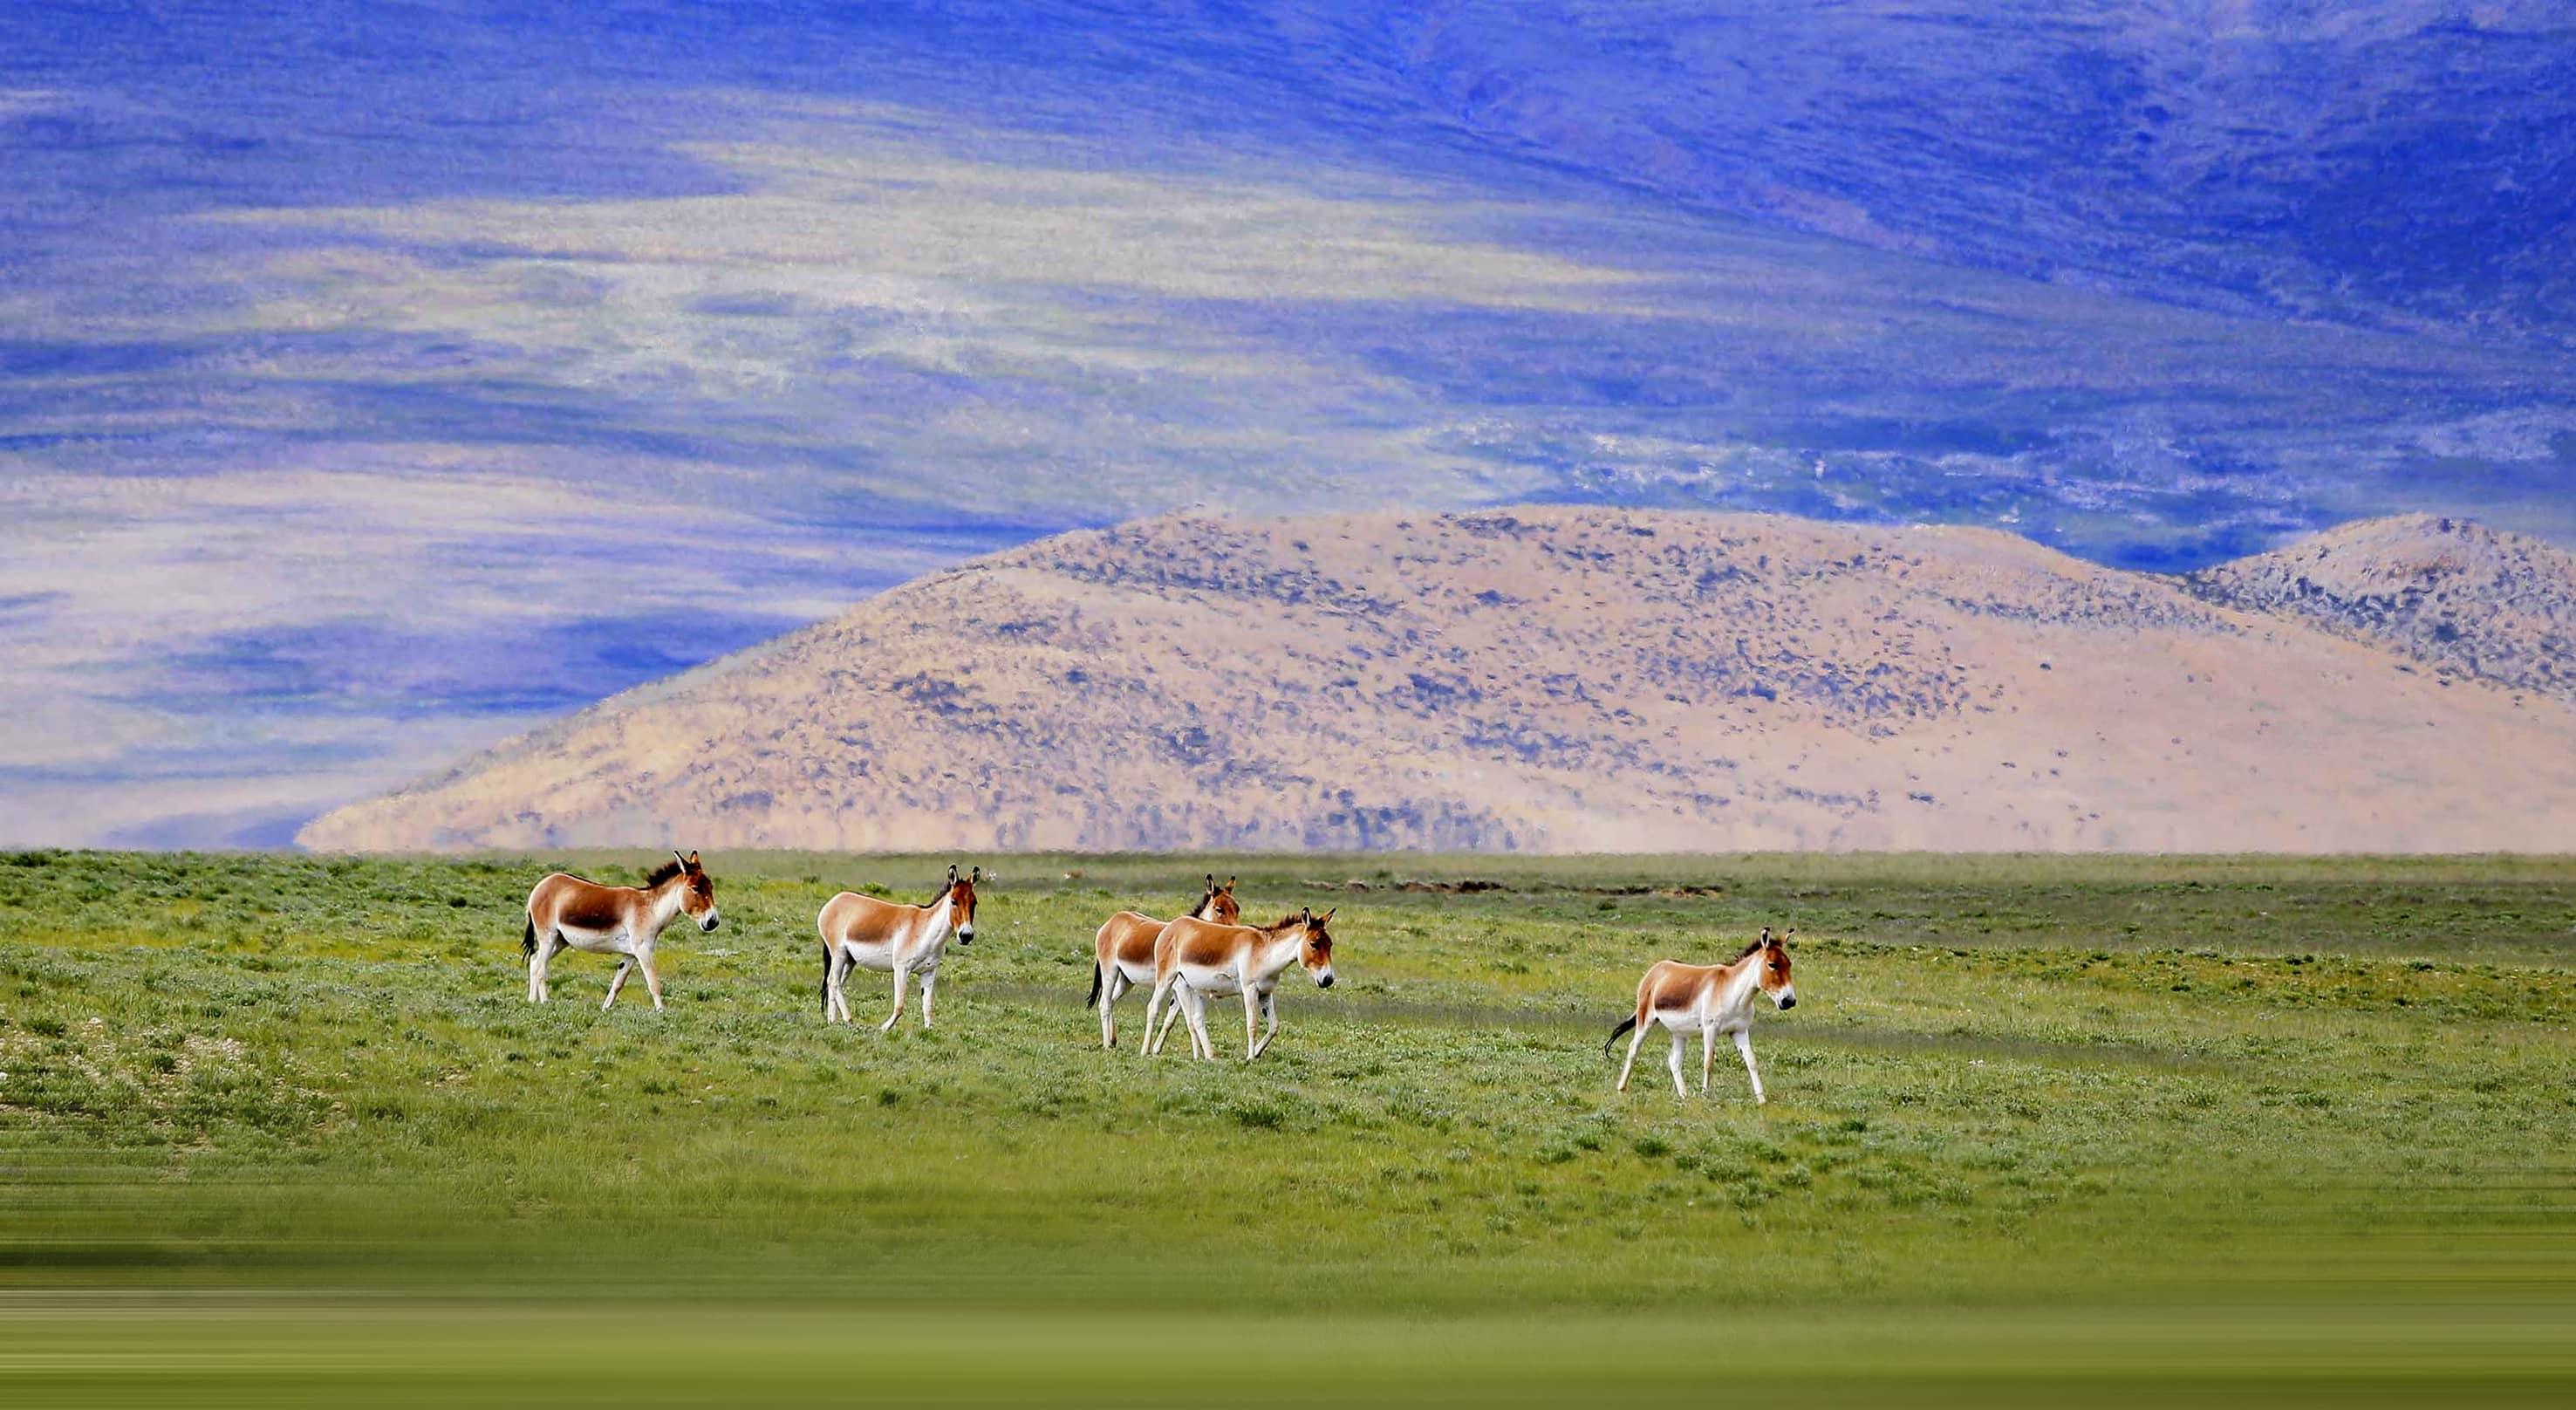 Grazing donkeys in Tibet